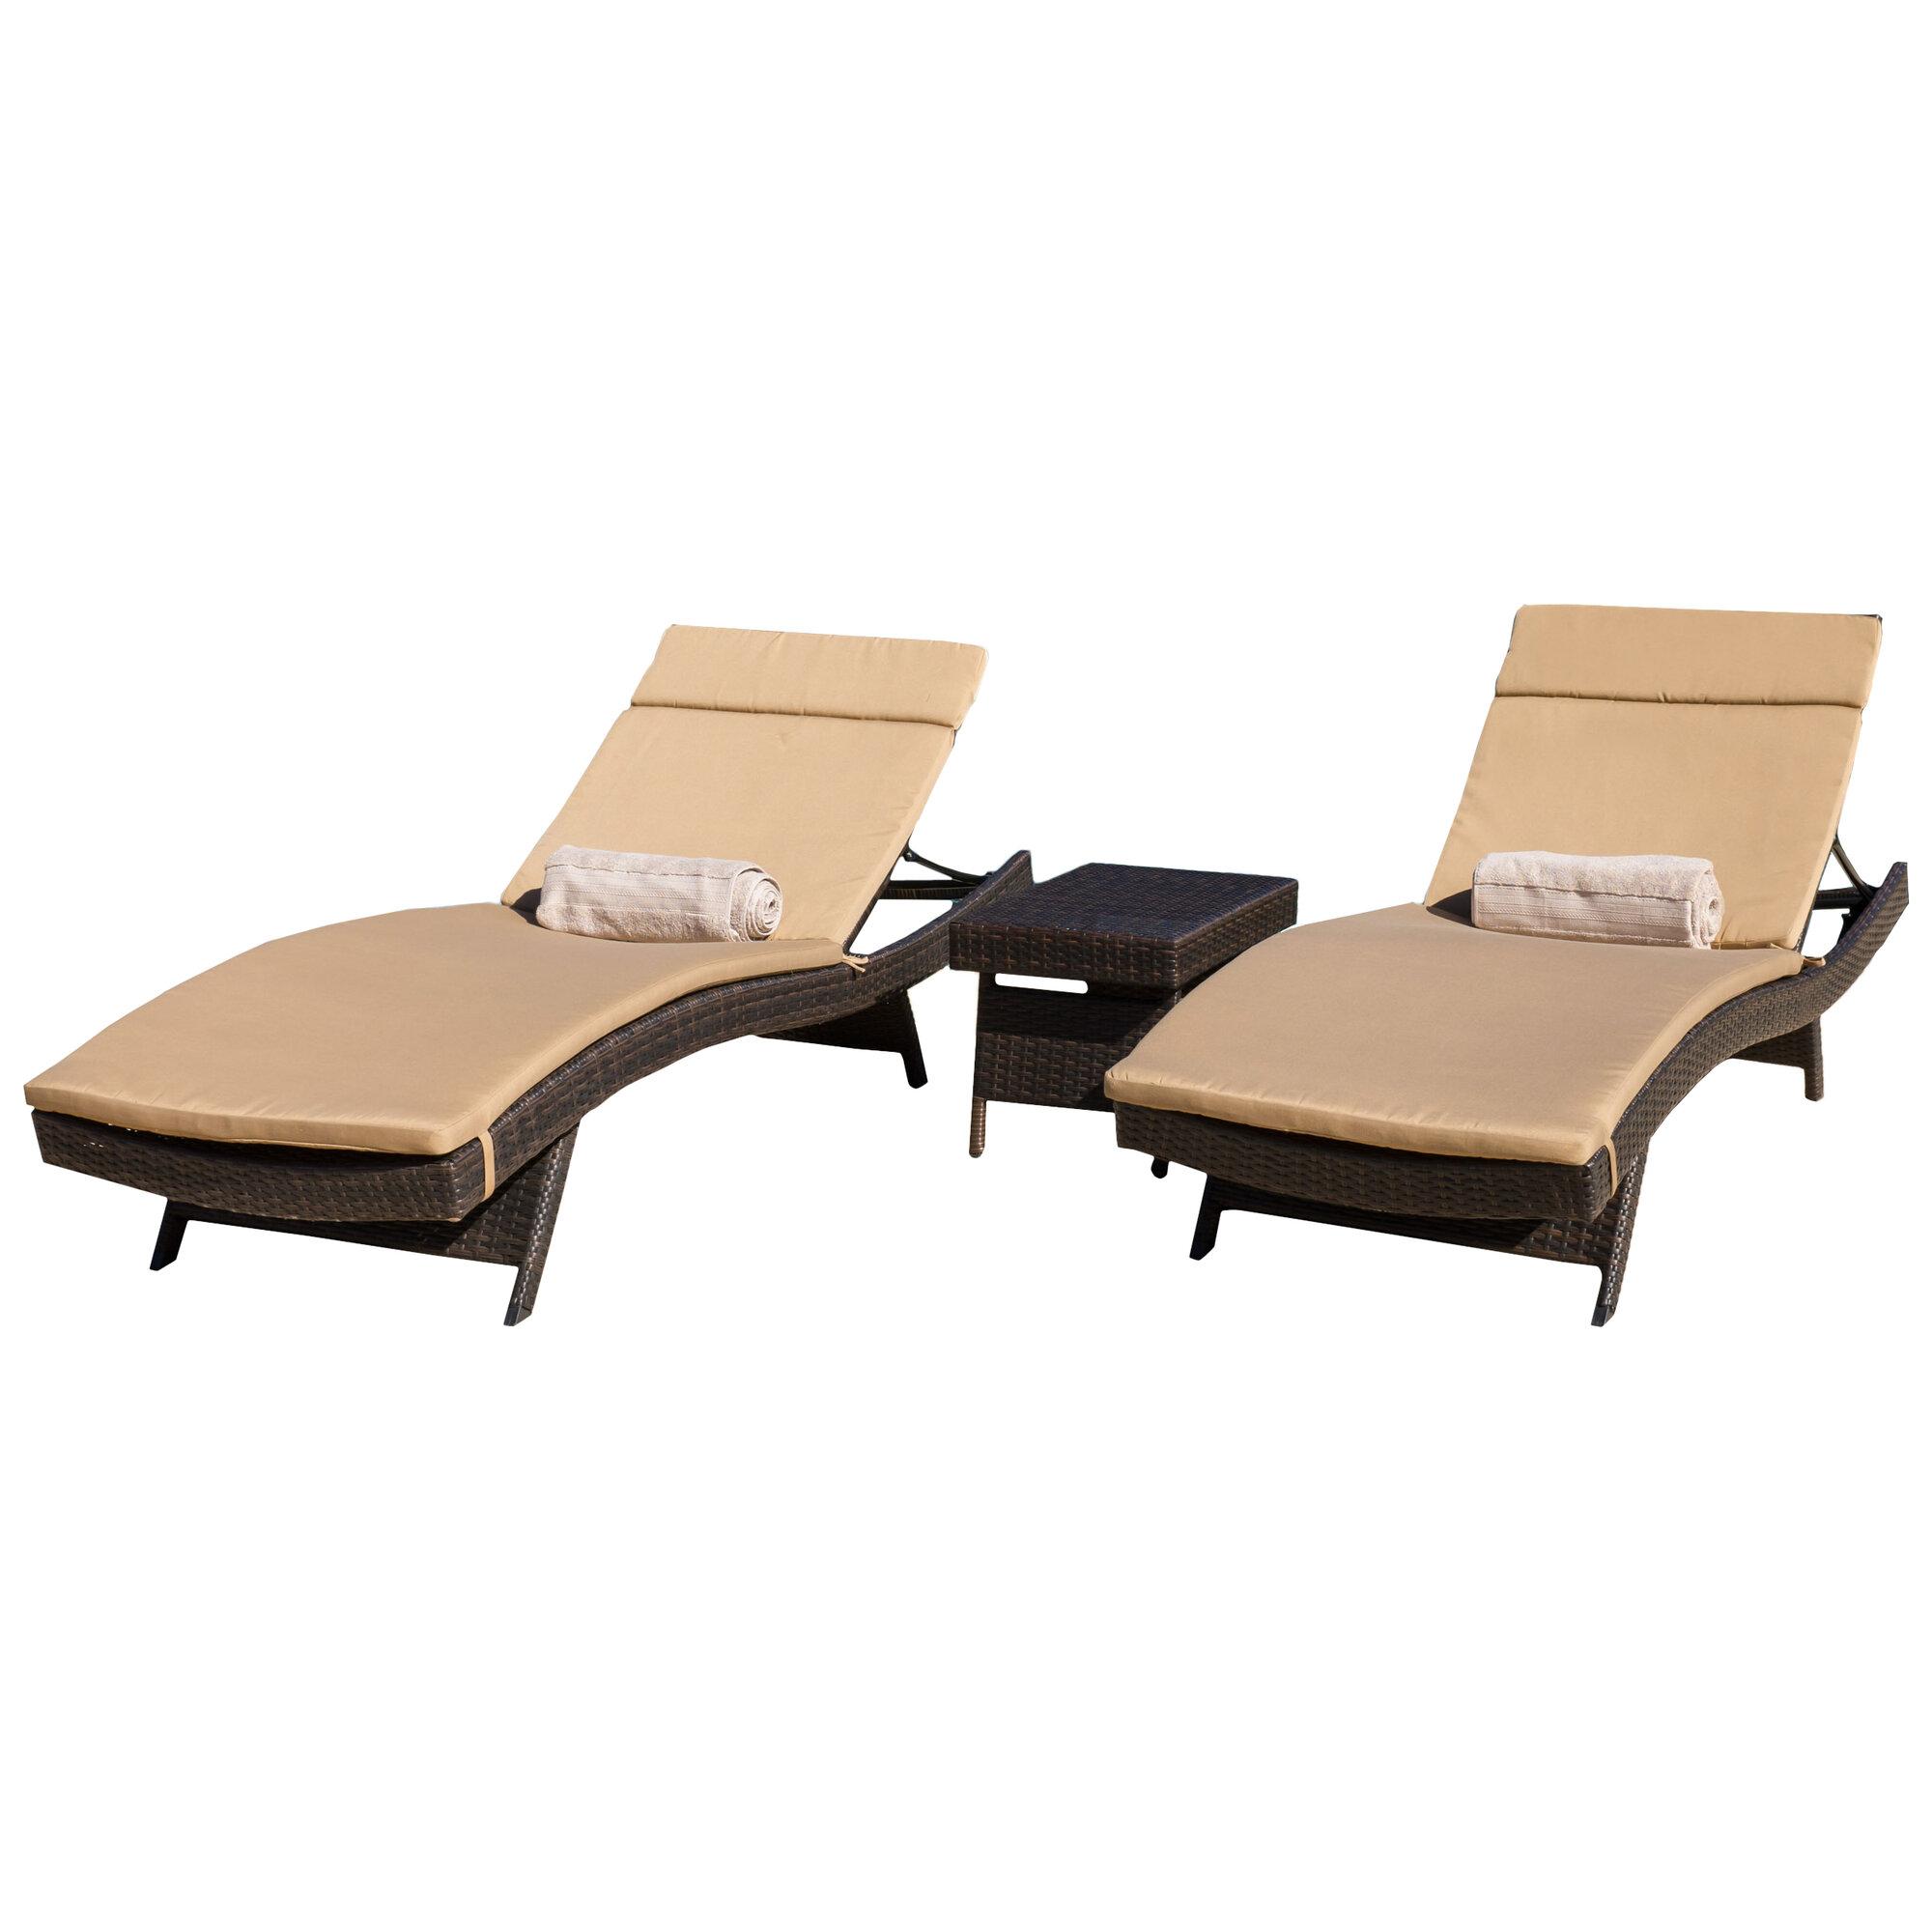 Home Loft Concepts Rio Vista Chaise Lounge Set with Cushion | eBay